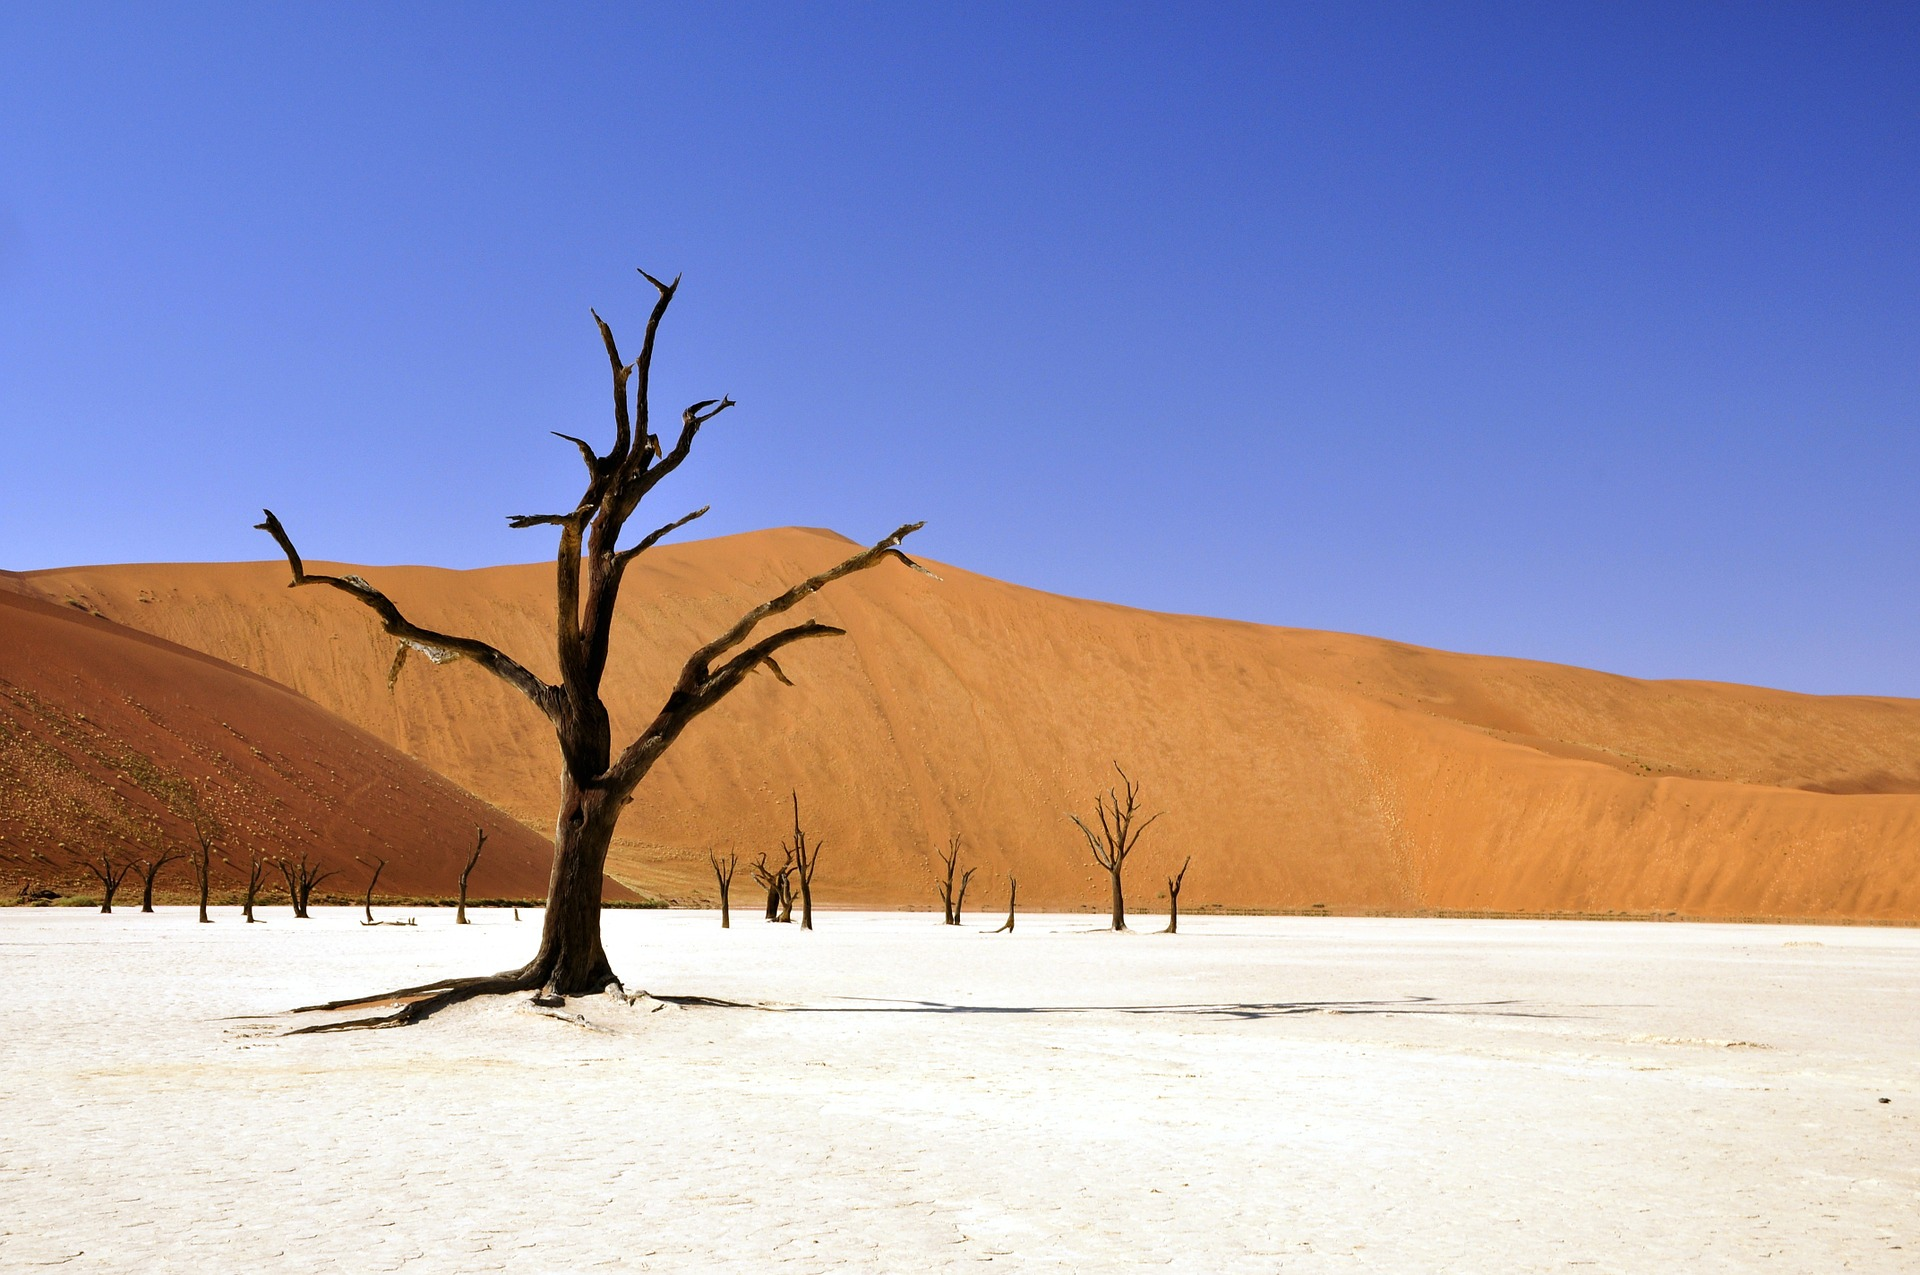 tree-desert-dali-pixabay-64311_1920.jpg